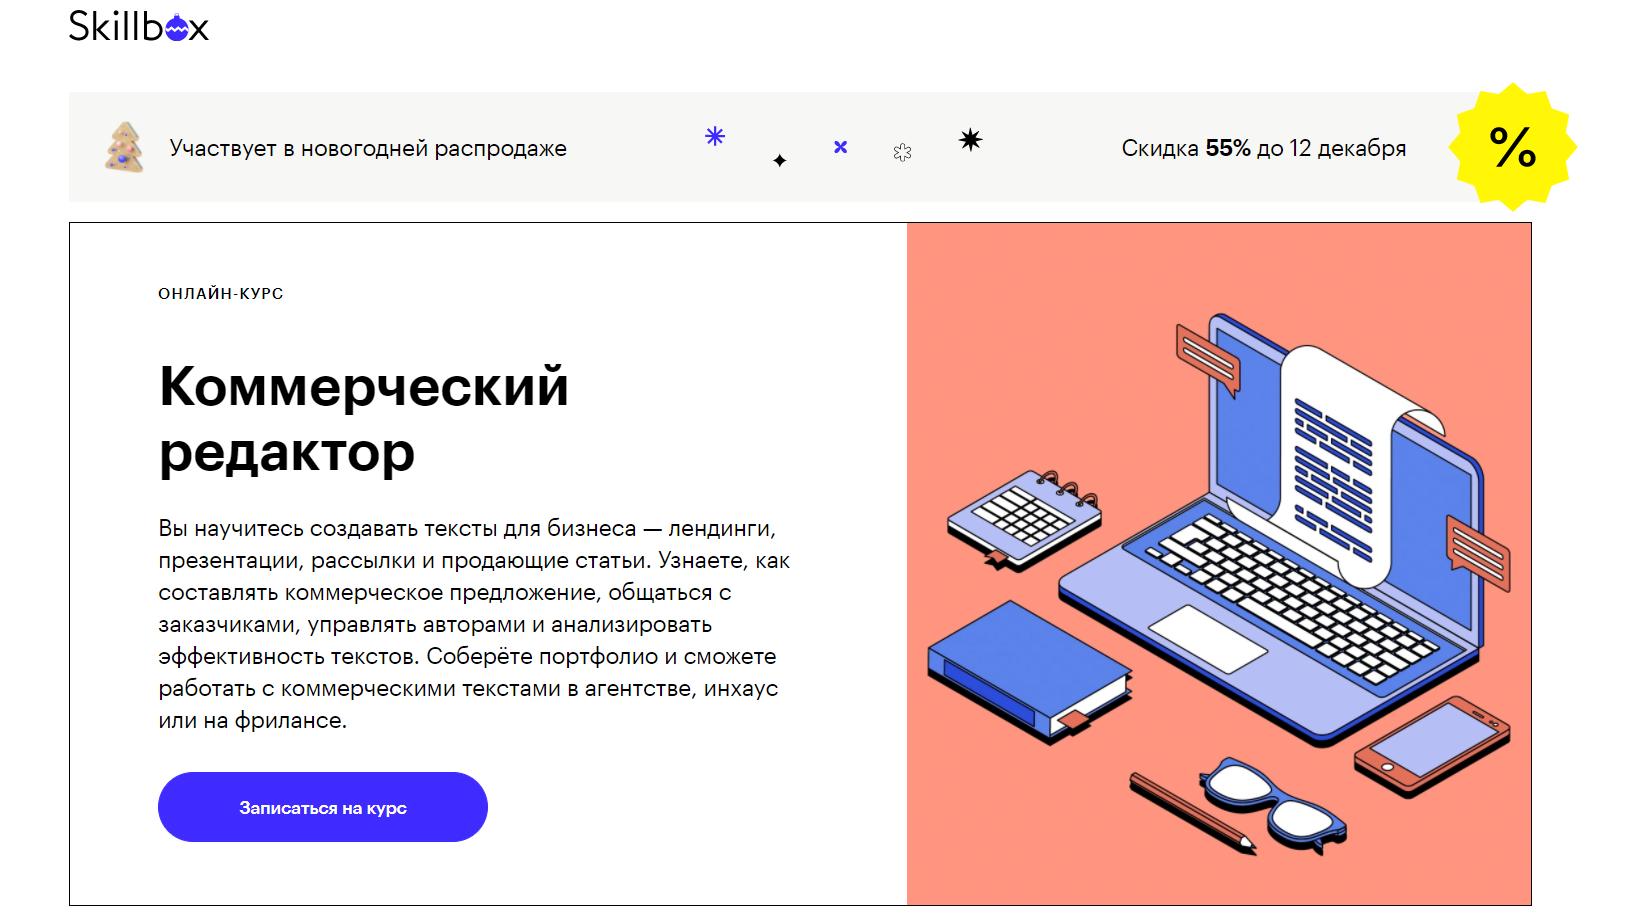 skillbox курс коммерческий редактор текстов